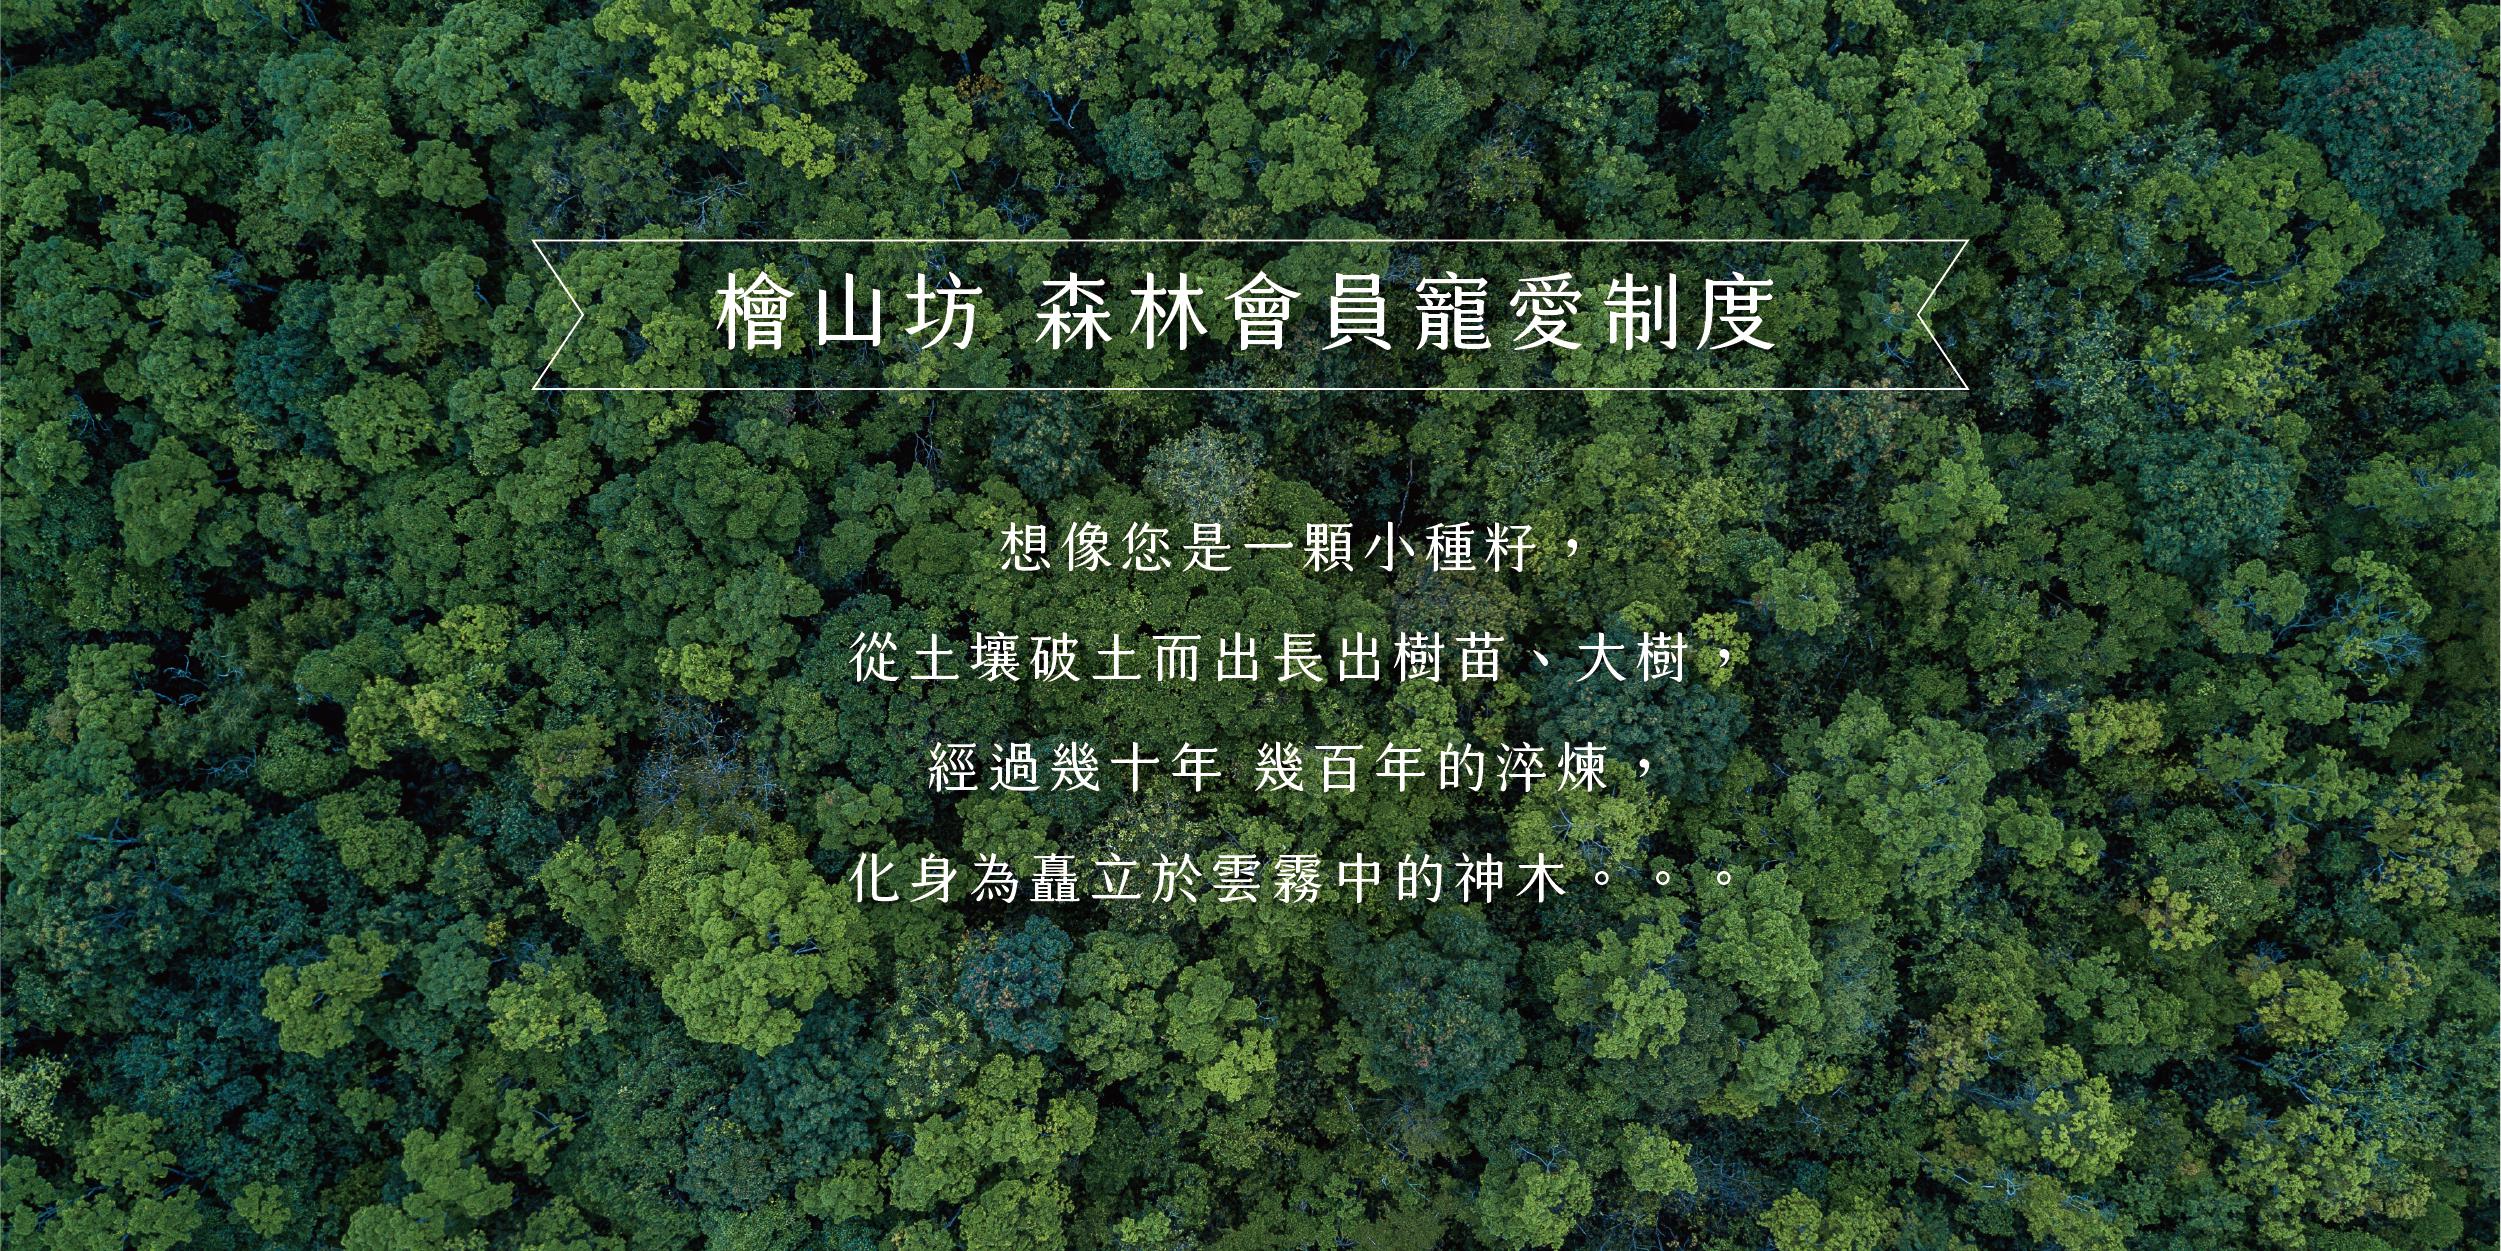 檜山坊 Kuai Shan Fang